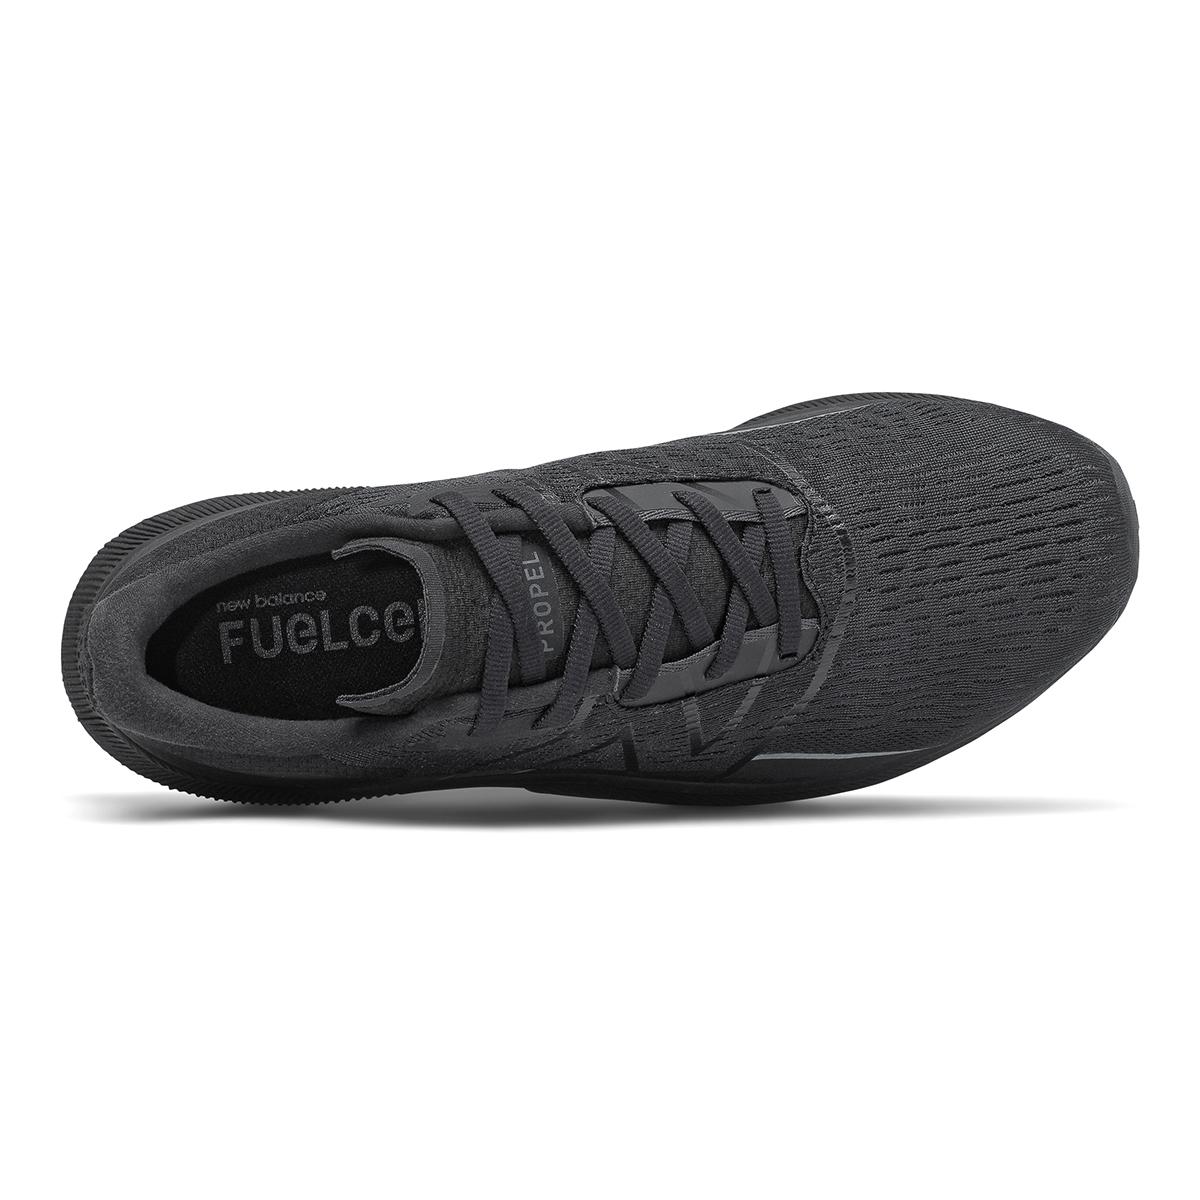 Men's New Balance Fuelcell Propel V2 Running Shoe - Color: Black - Size: 7 - Width: Wide, Black, large, image 3